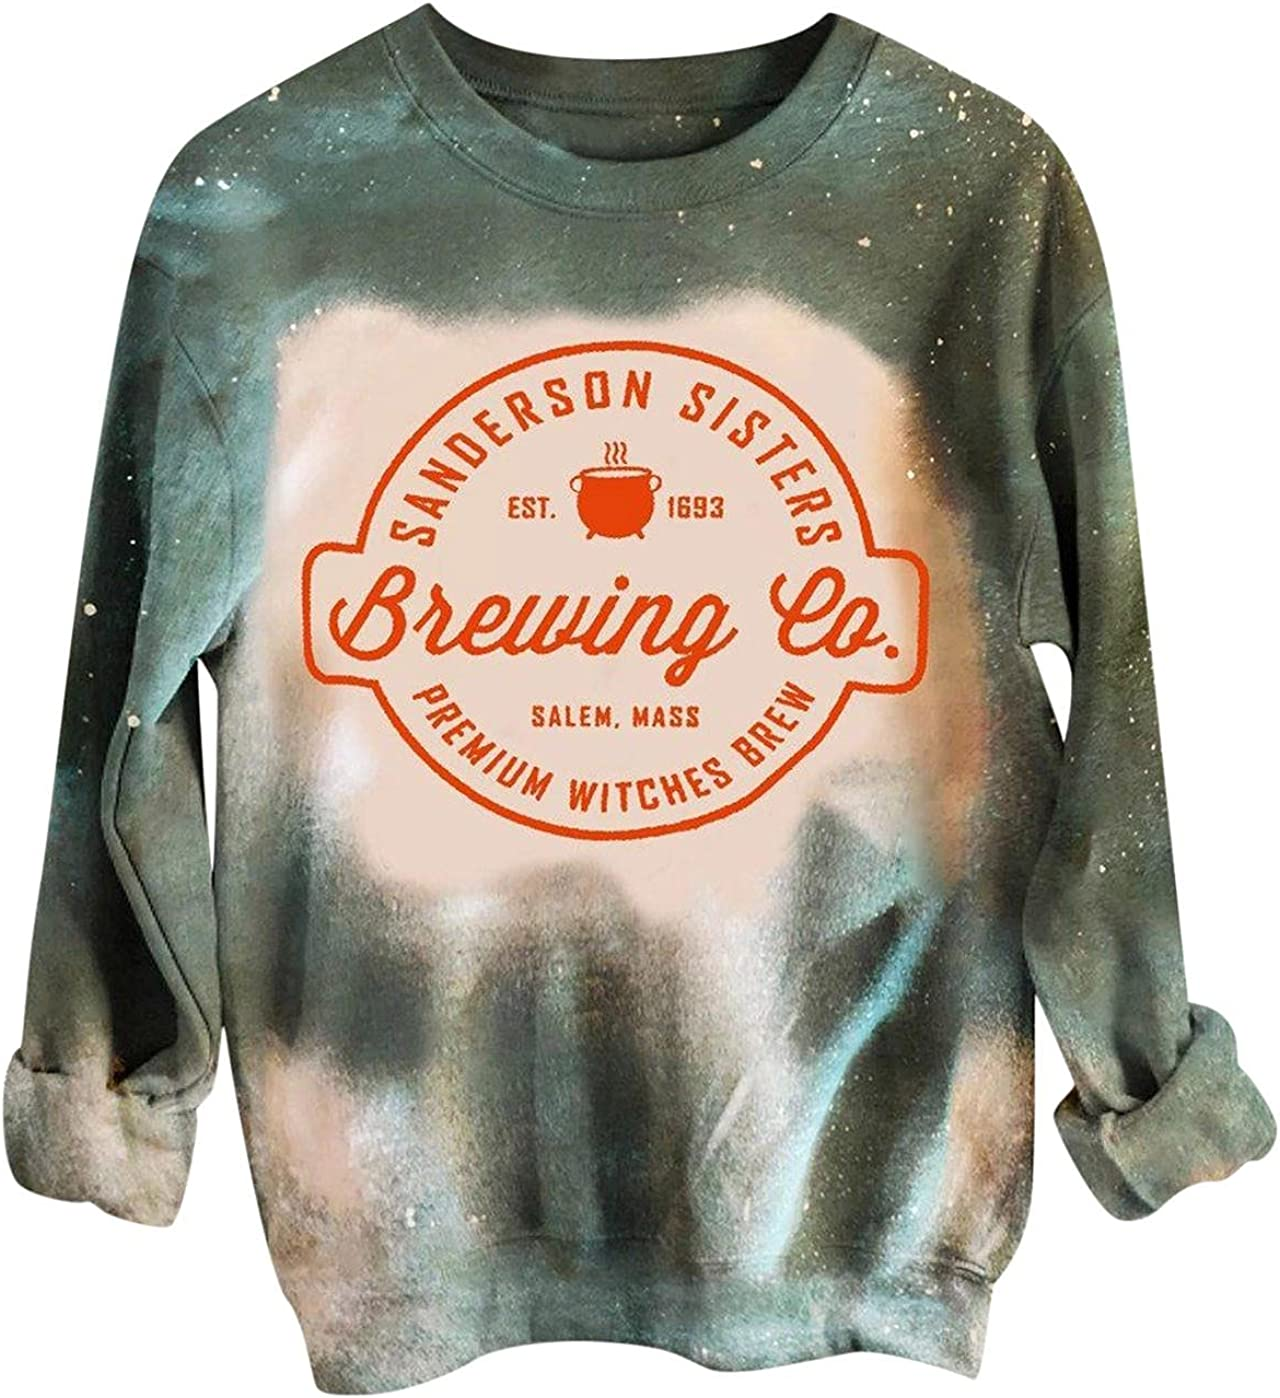 AODONG Halloween Sweaters for Women Rainbow Tie Dye Long Sleeves Sweatshirts Loose Pullover Tops